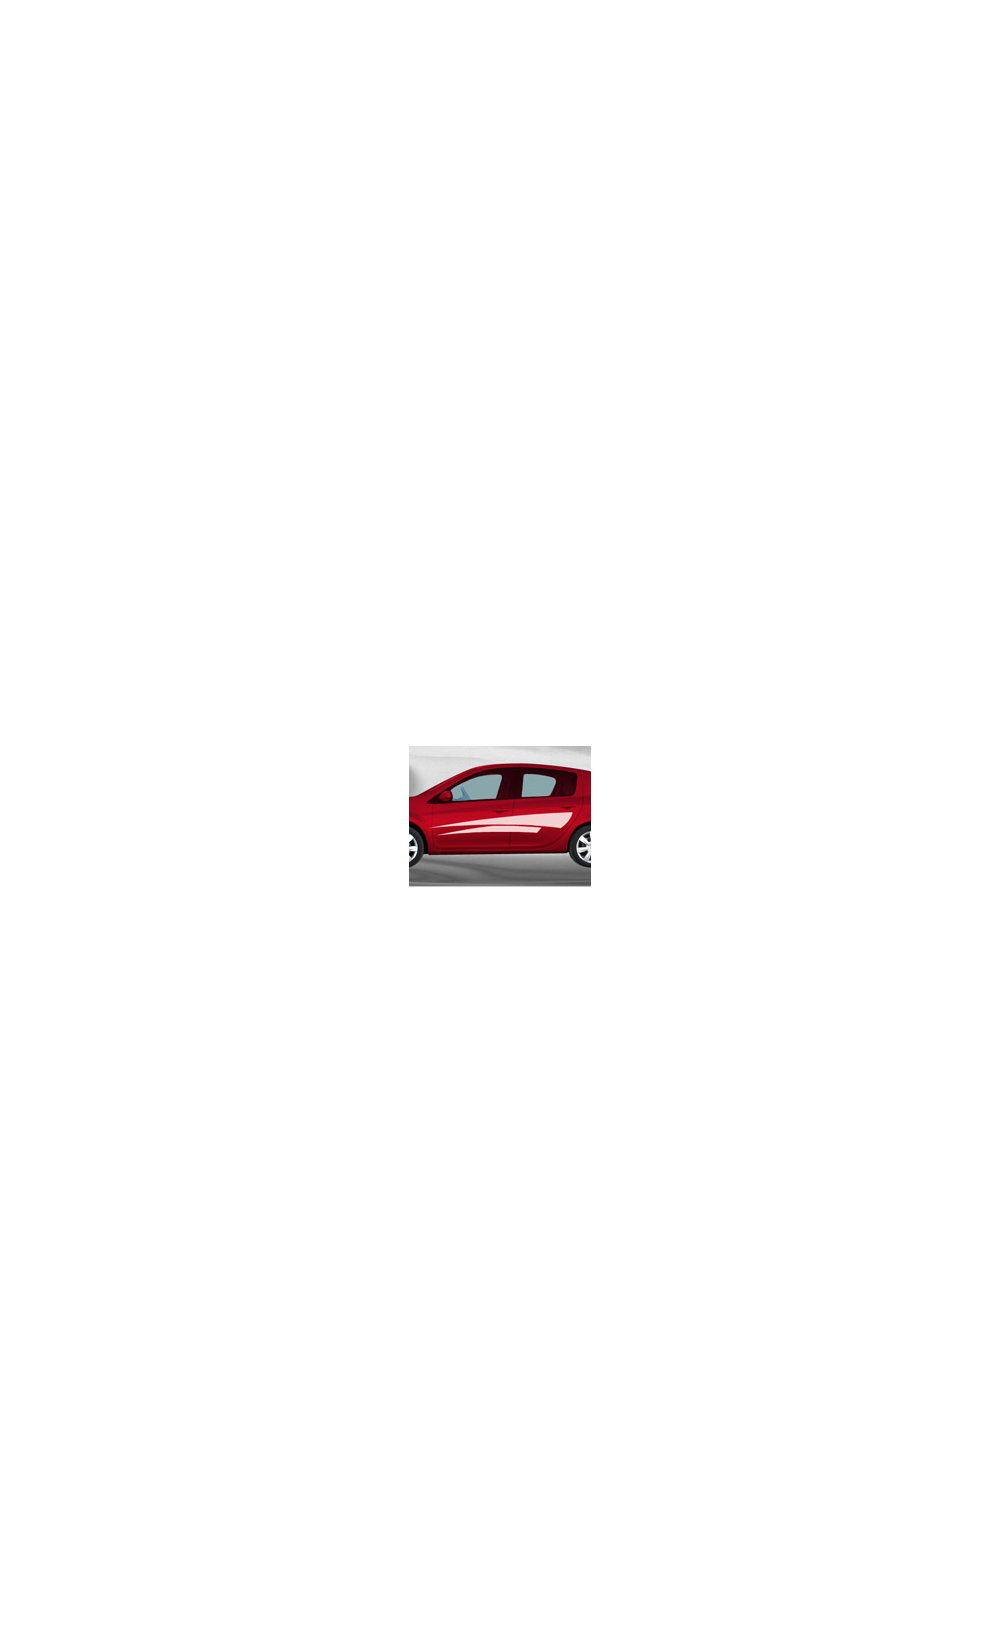 bande autocollante voiture double bande autocollante vinyle pour auto voiture bande liserets. Black Bedroom Furniture Sets. Home Design Ideas